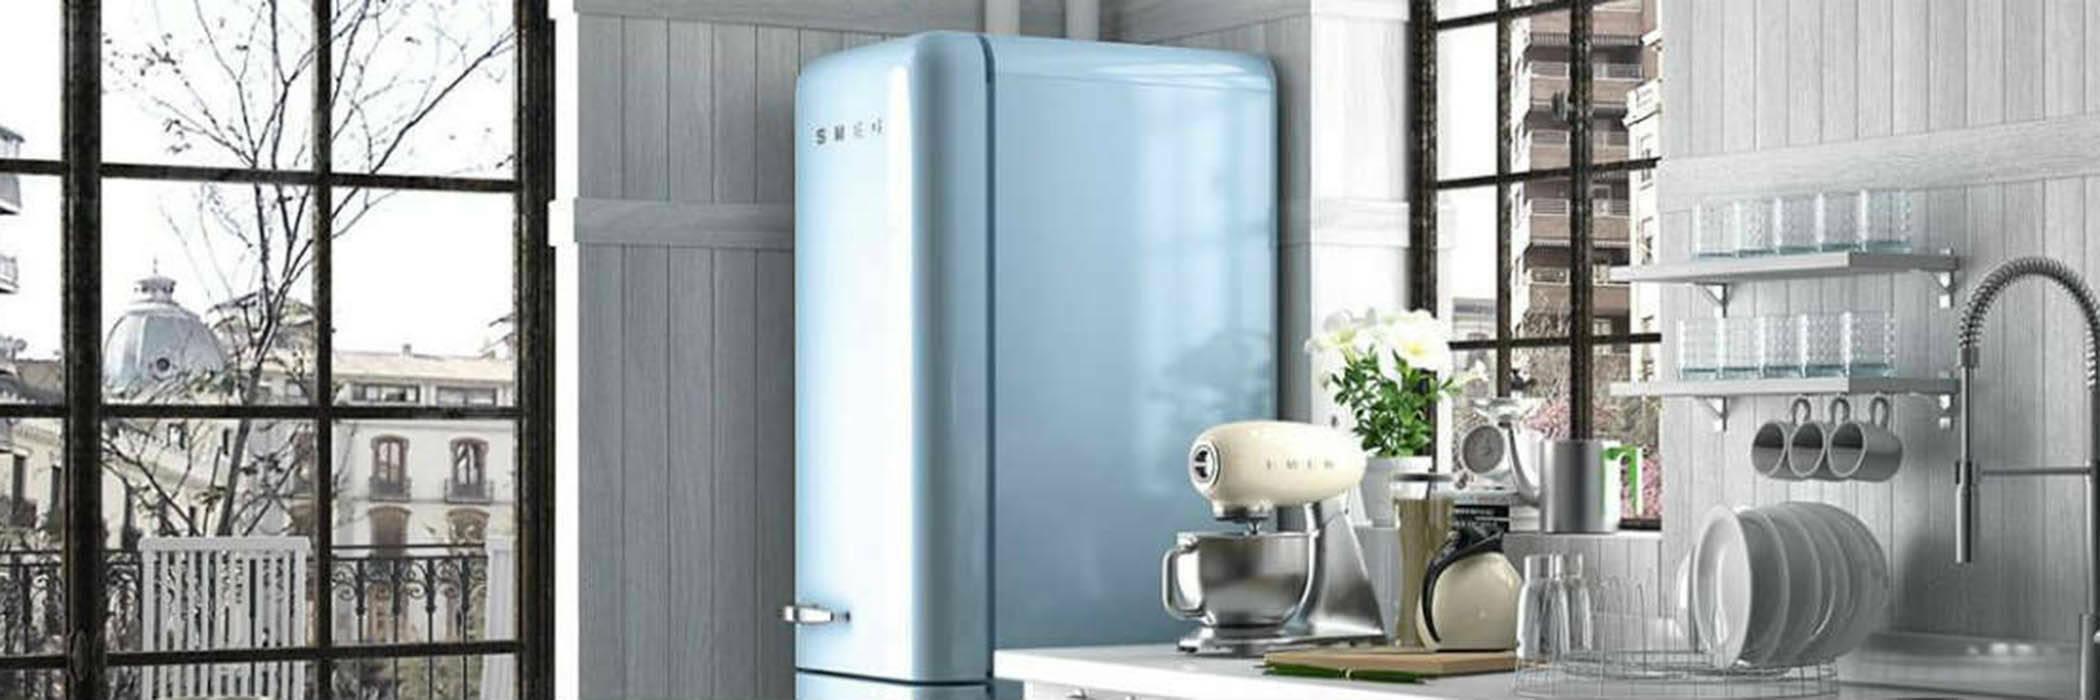 kictchen-with-smeg-fridge-freezer